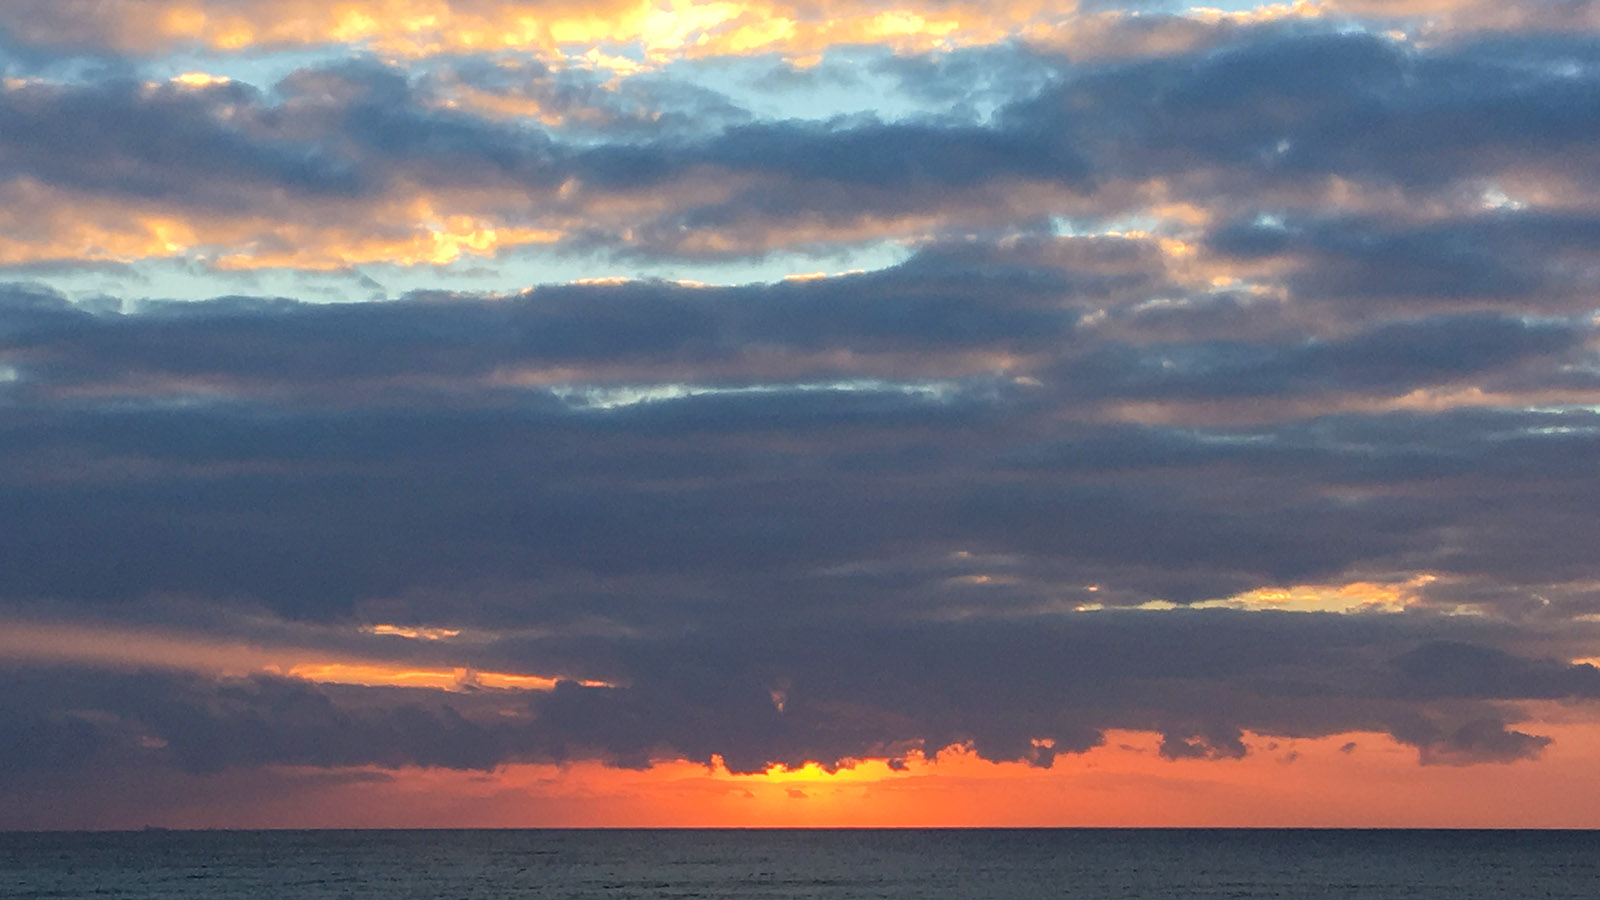 Sonnenaufgang an der Costa Brava. Foto: Hilke Maunder